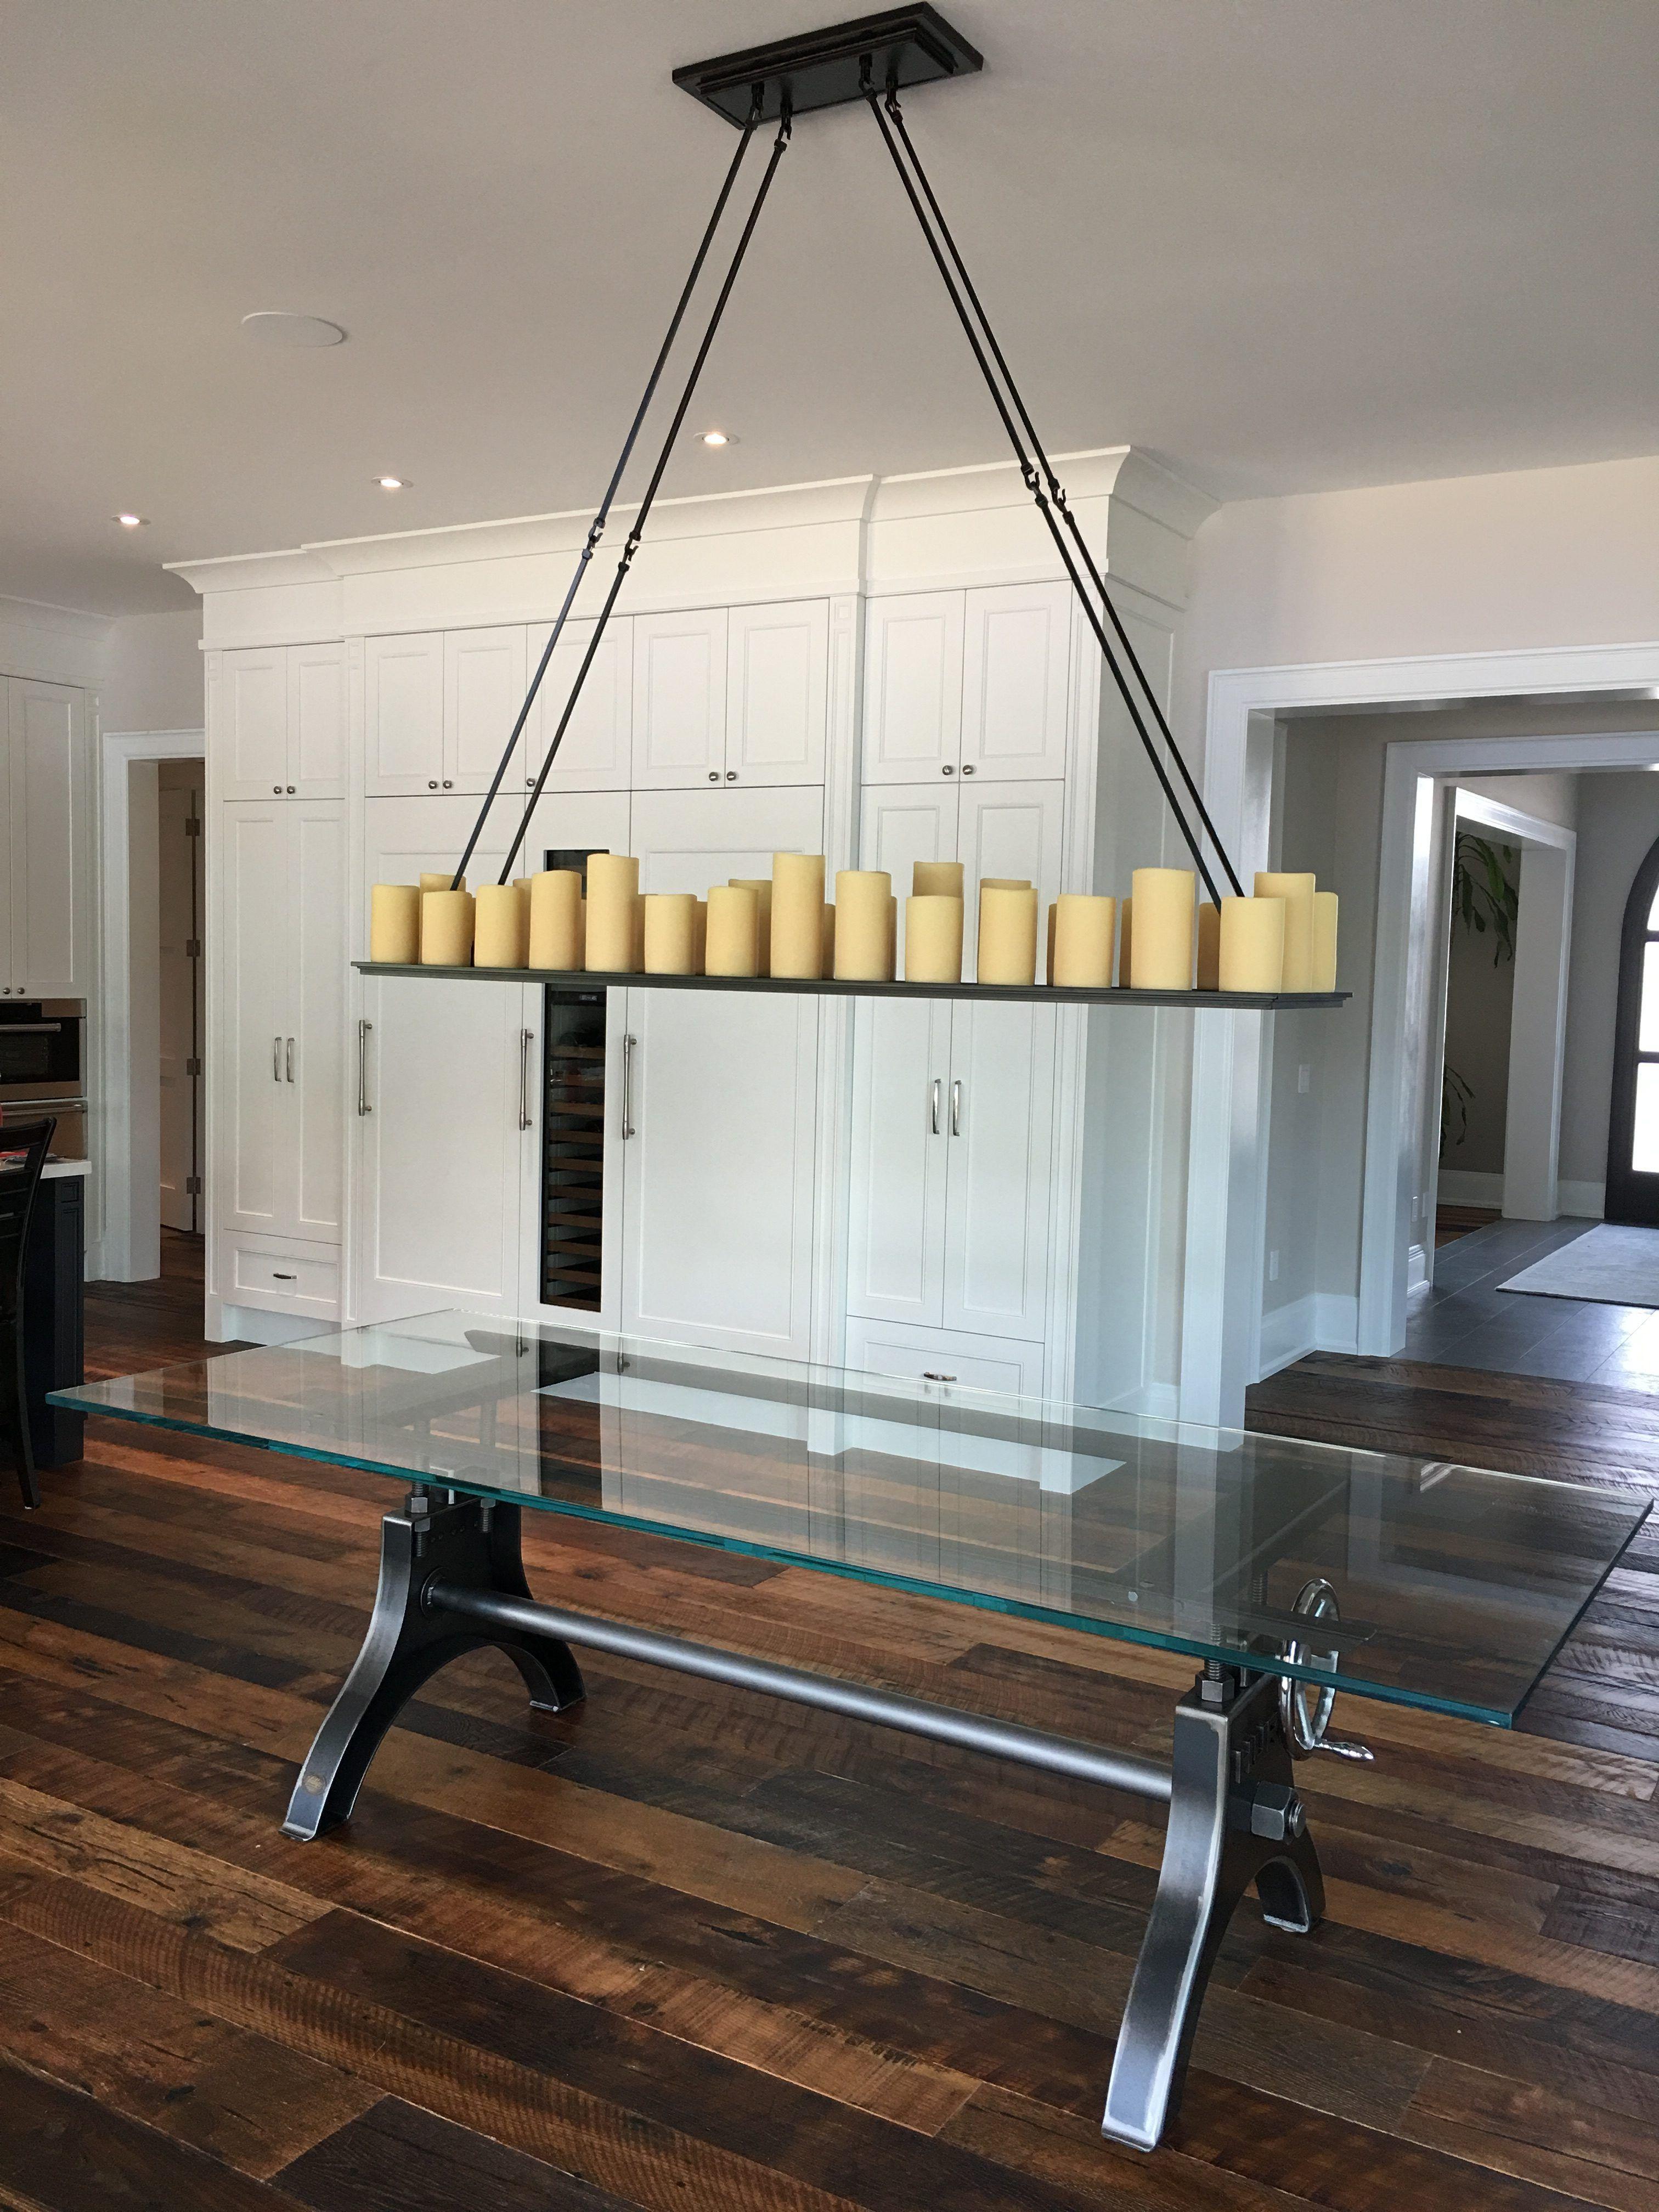 Hure dining table 2018 loft muebles muebles for Muebles industriales metal baratos